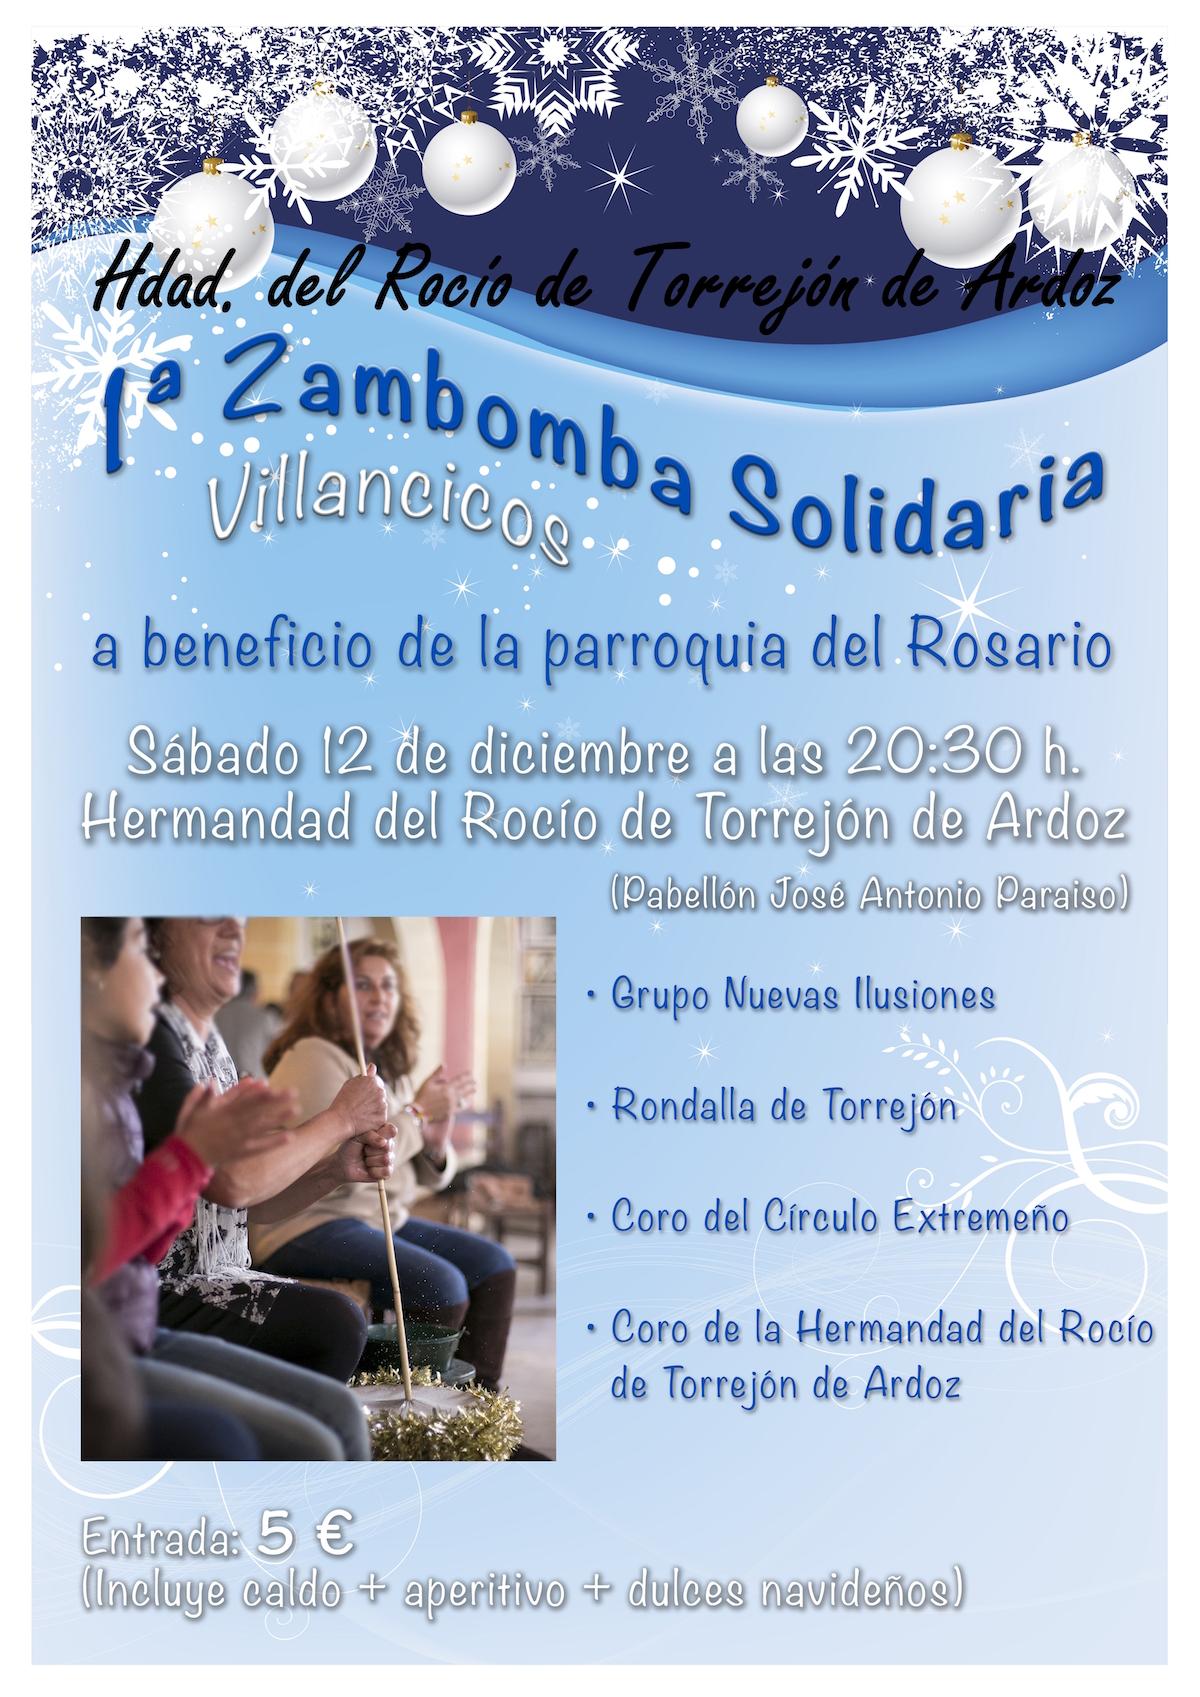 Torrejon - 2015-zambomba